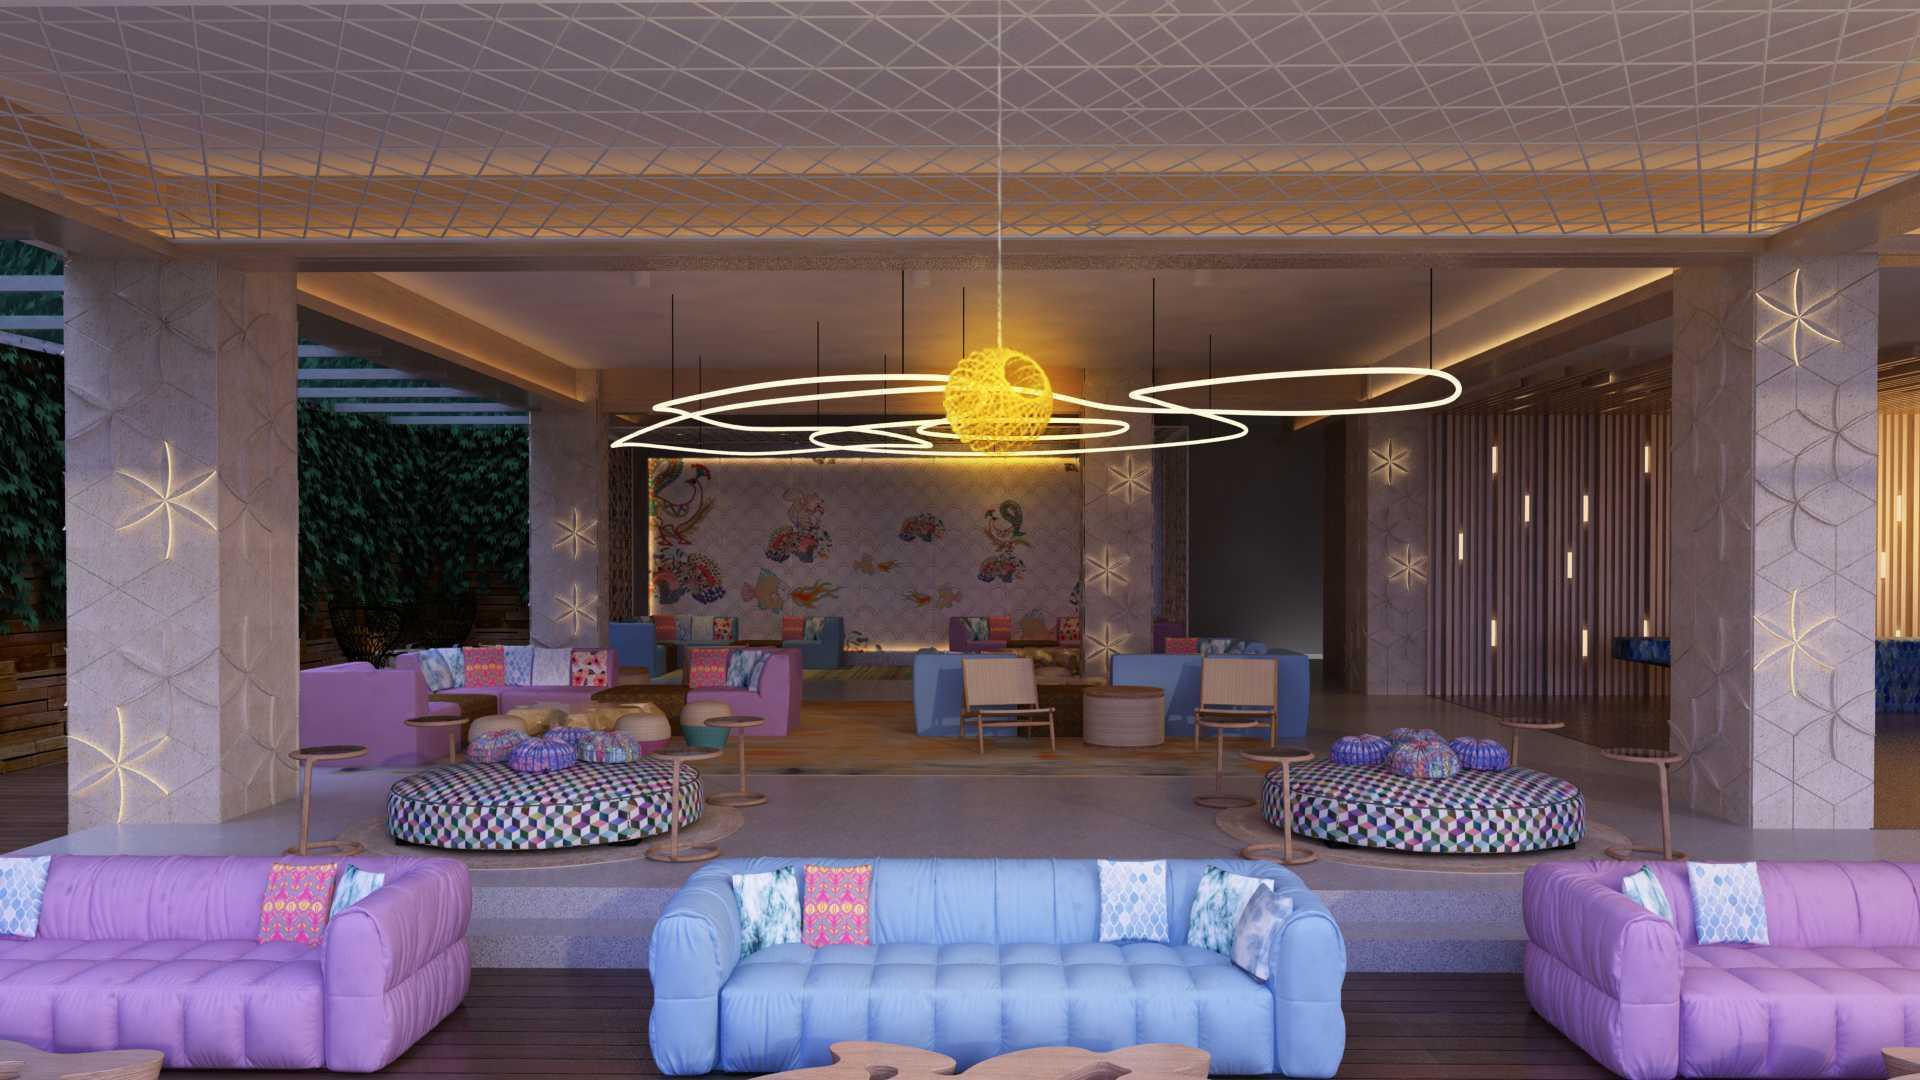 Vin•da•te Hotel Canggu Beach Bali - Indonesia Bali - Indonesia Seating Area Kontemporer  17577